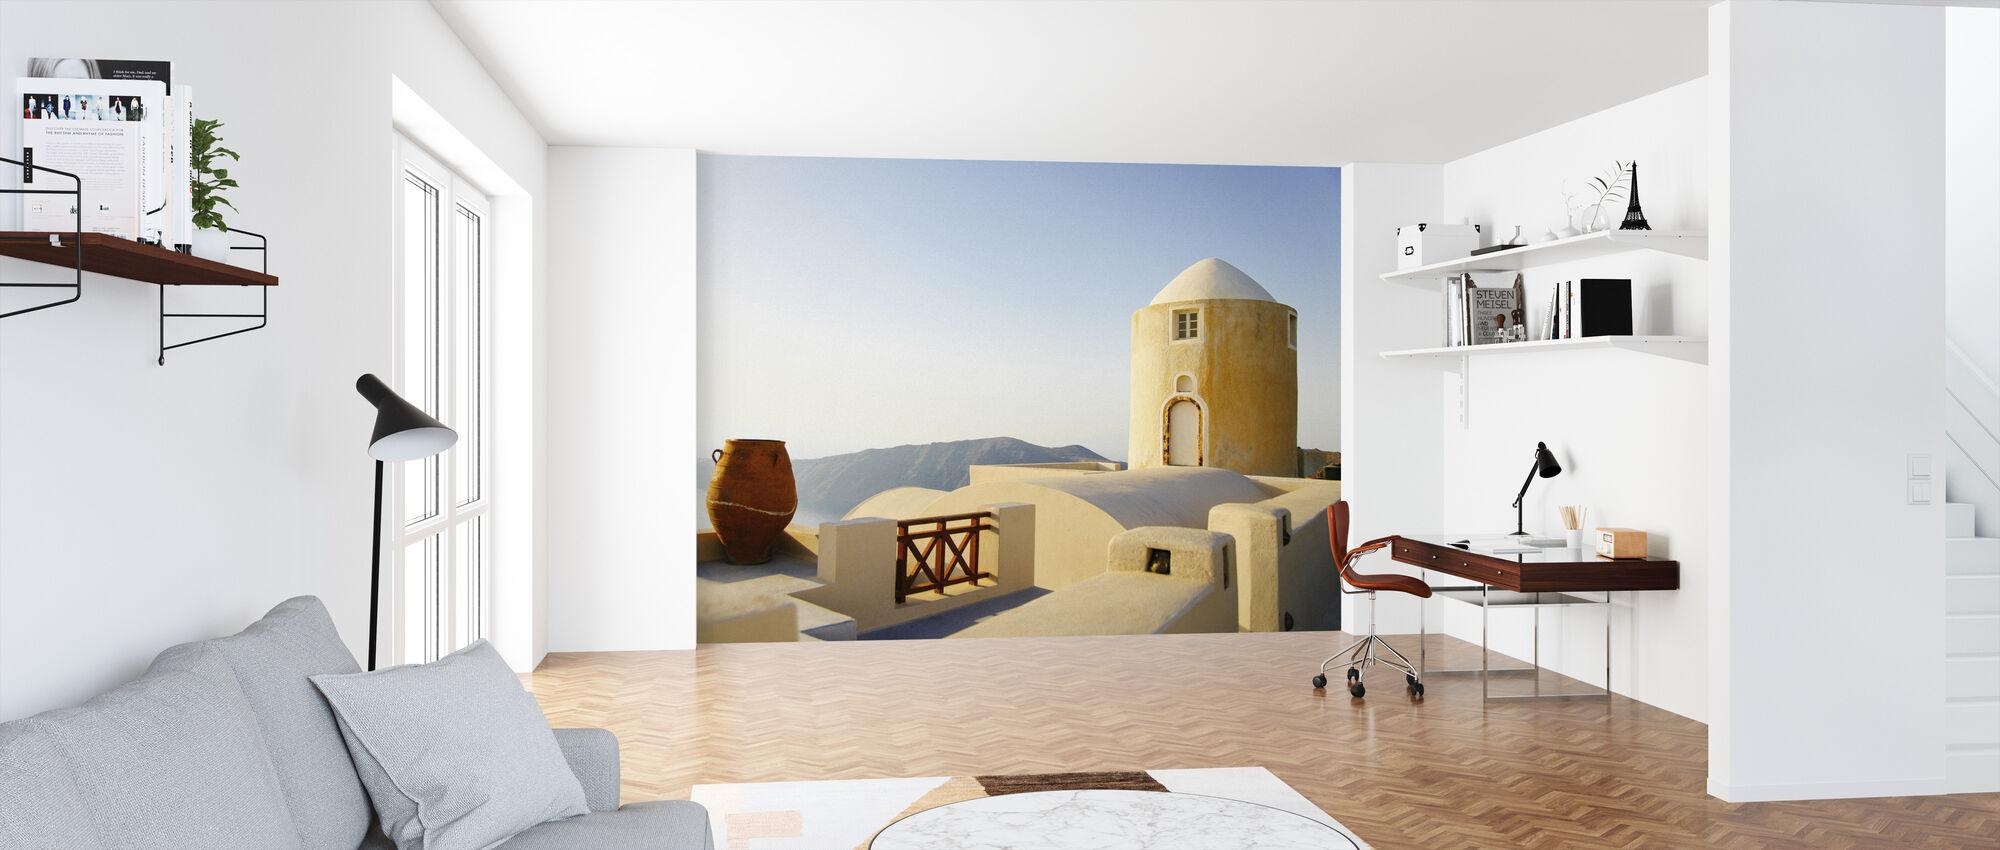 Santorini Building - Wallpaper - Office